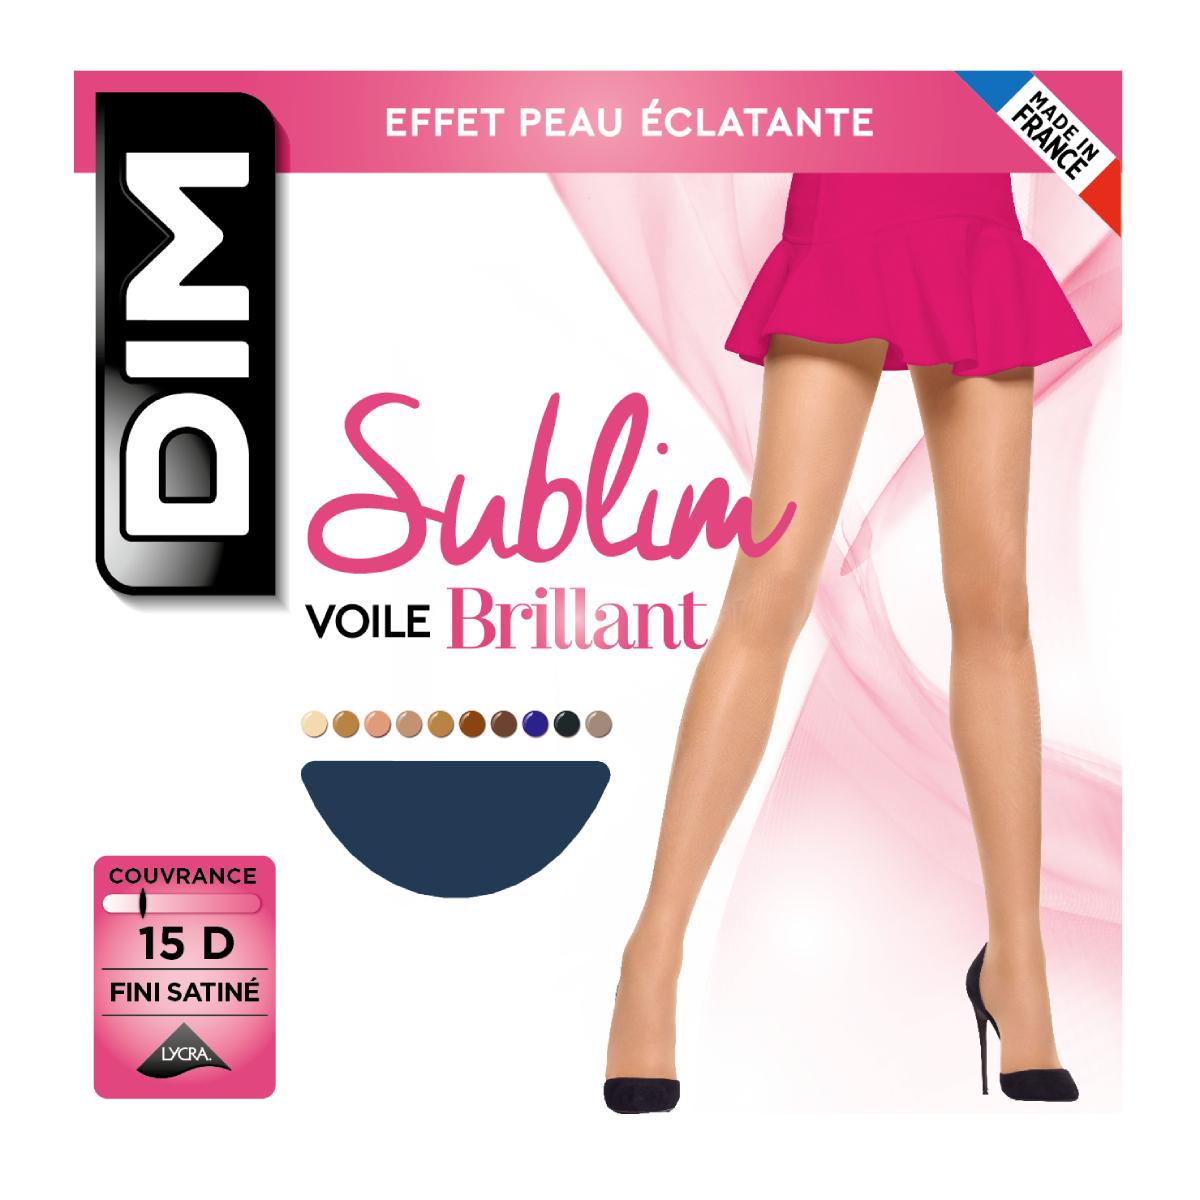 Collant Sublim Voile Brillant 15D - DIM - Modalova